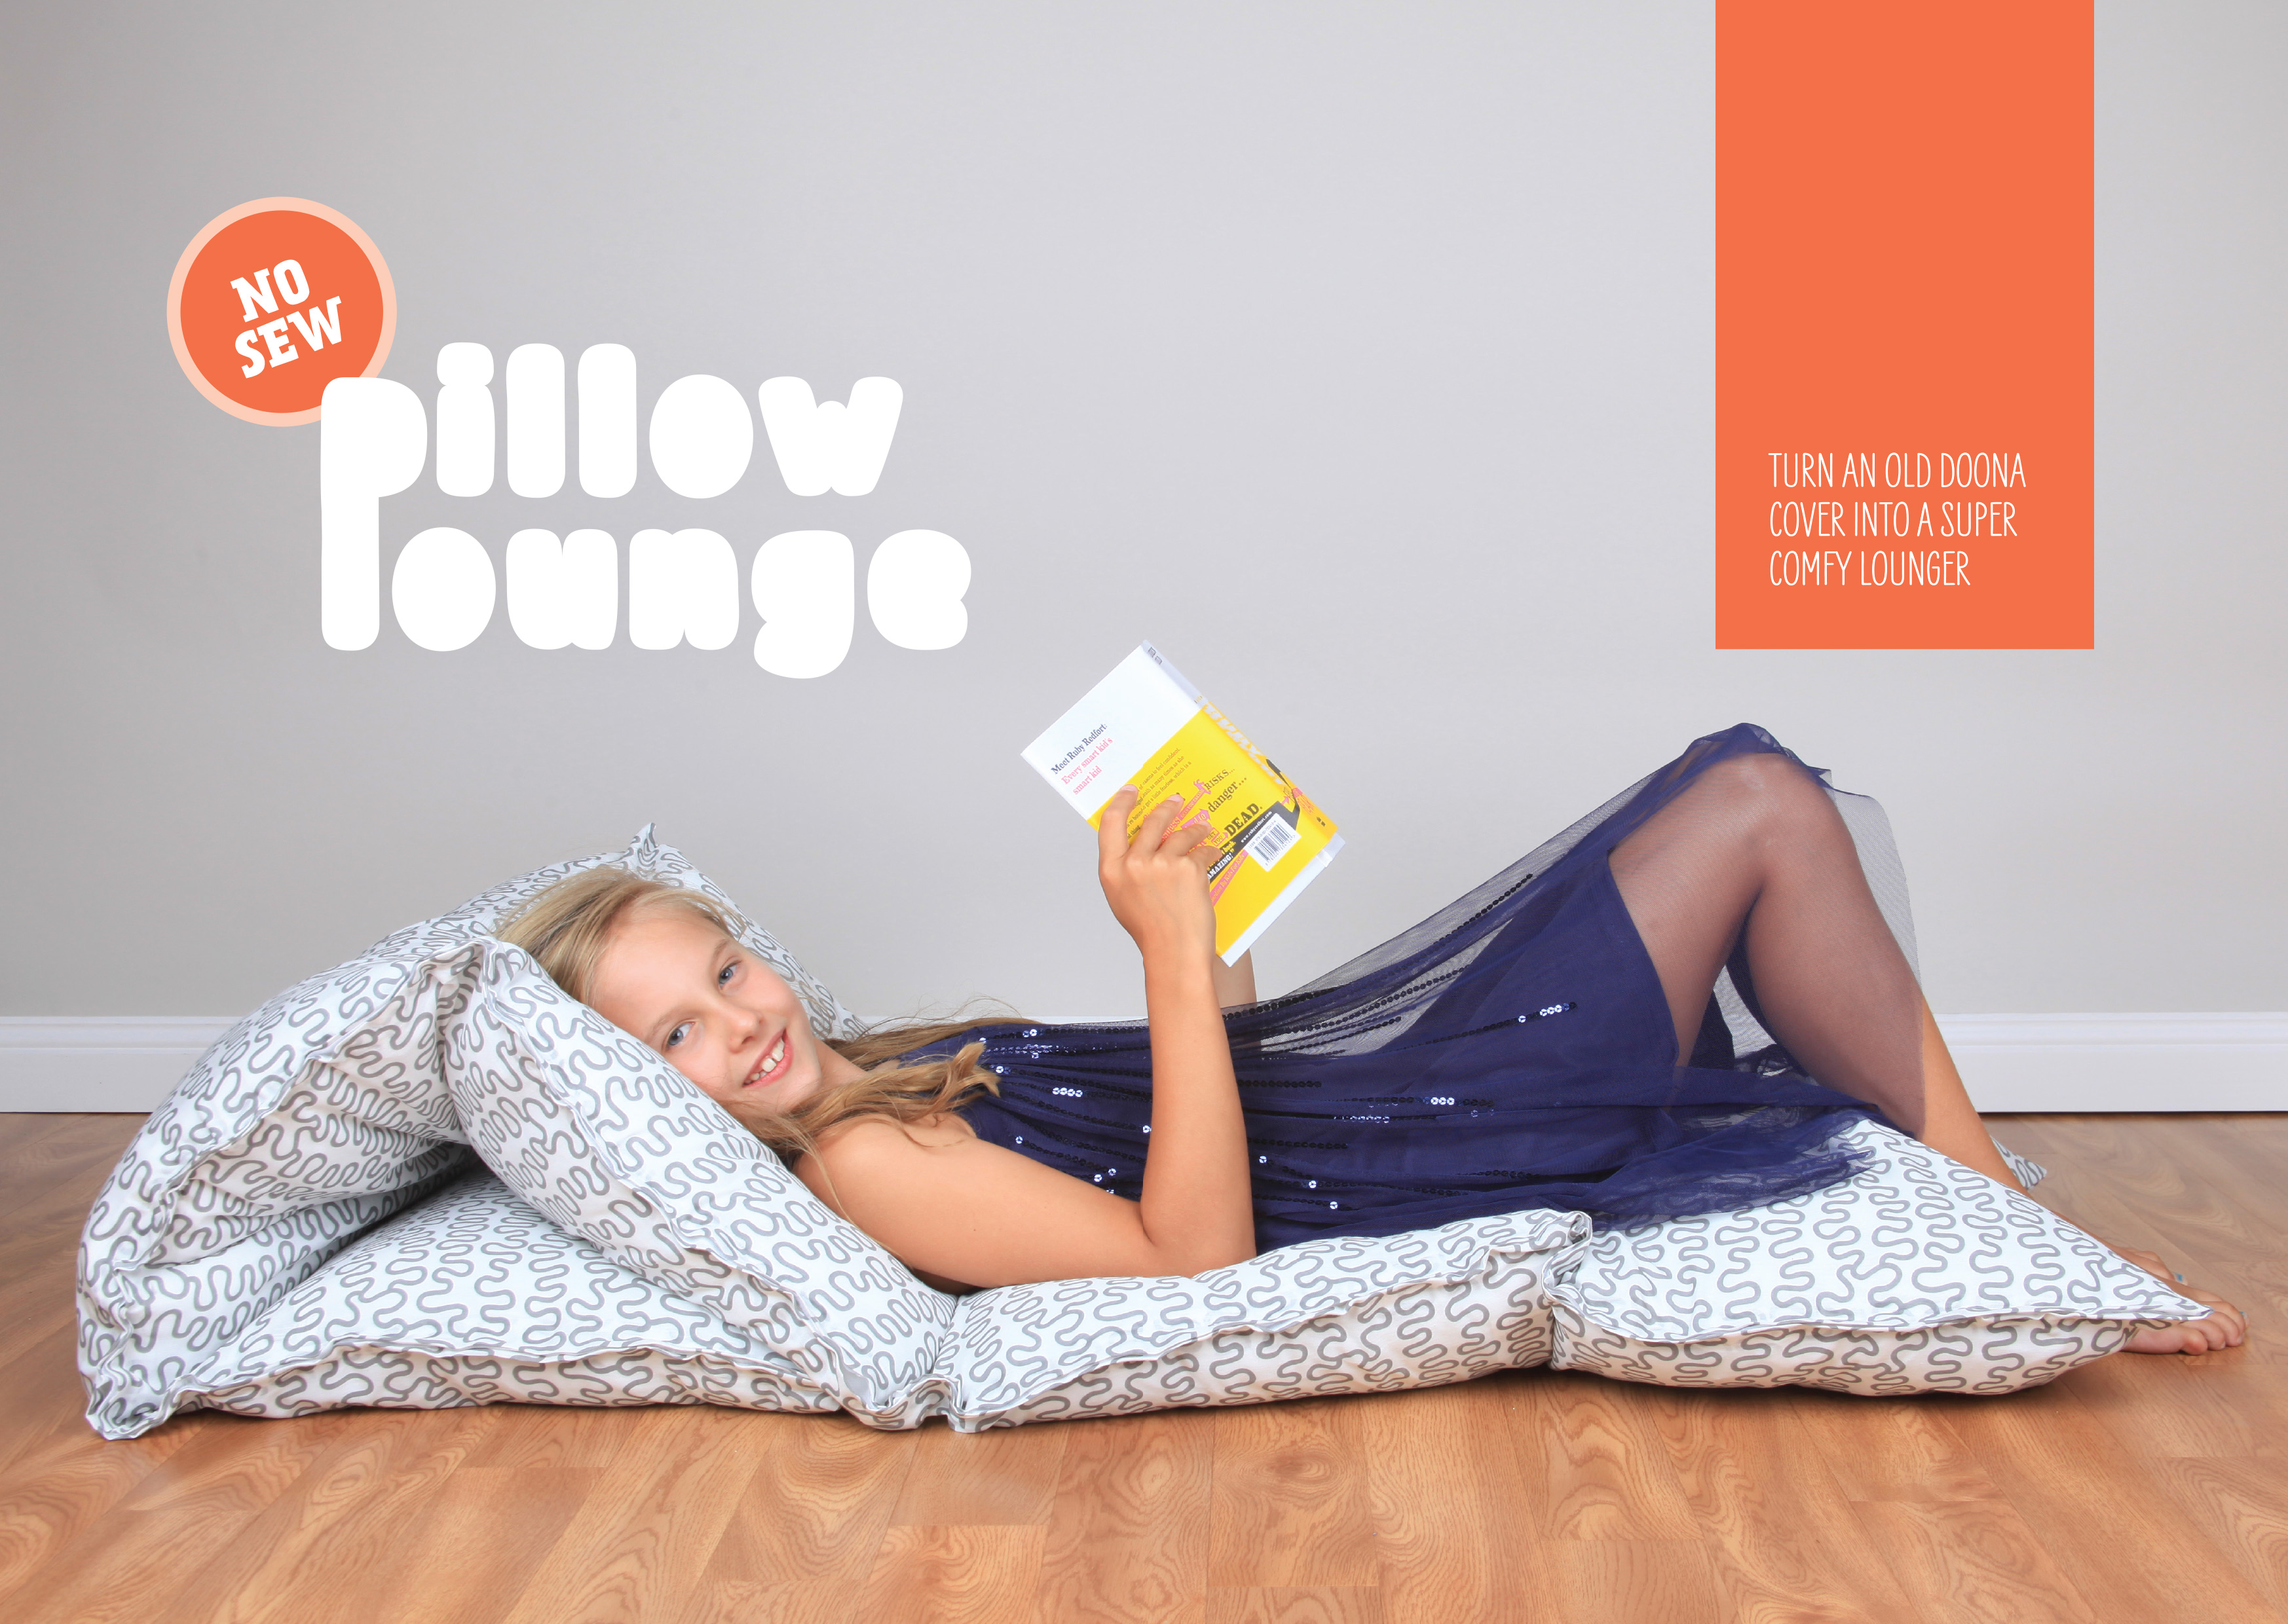 Lotta-pillow-lounge-1